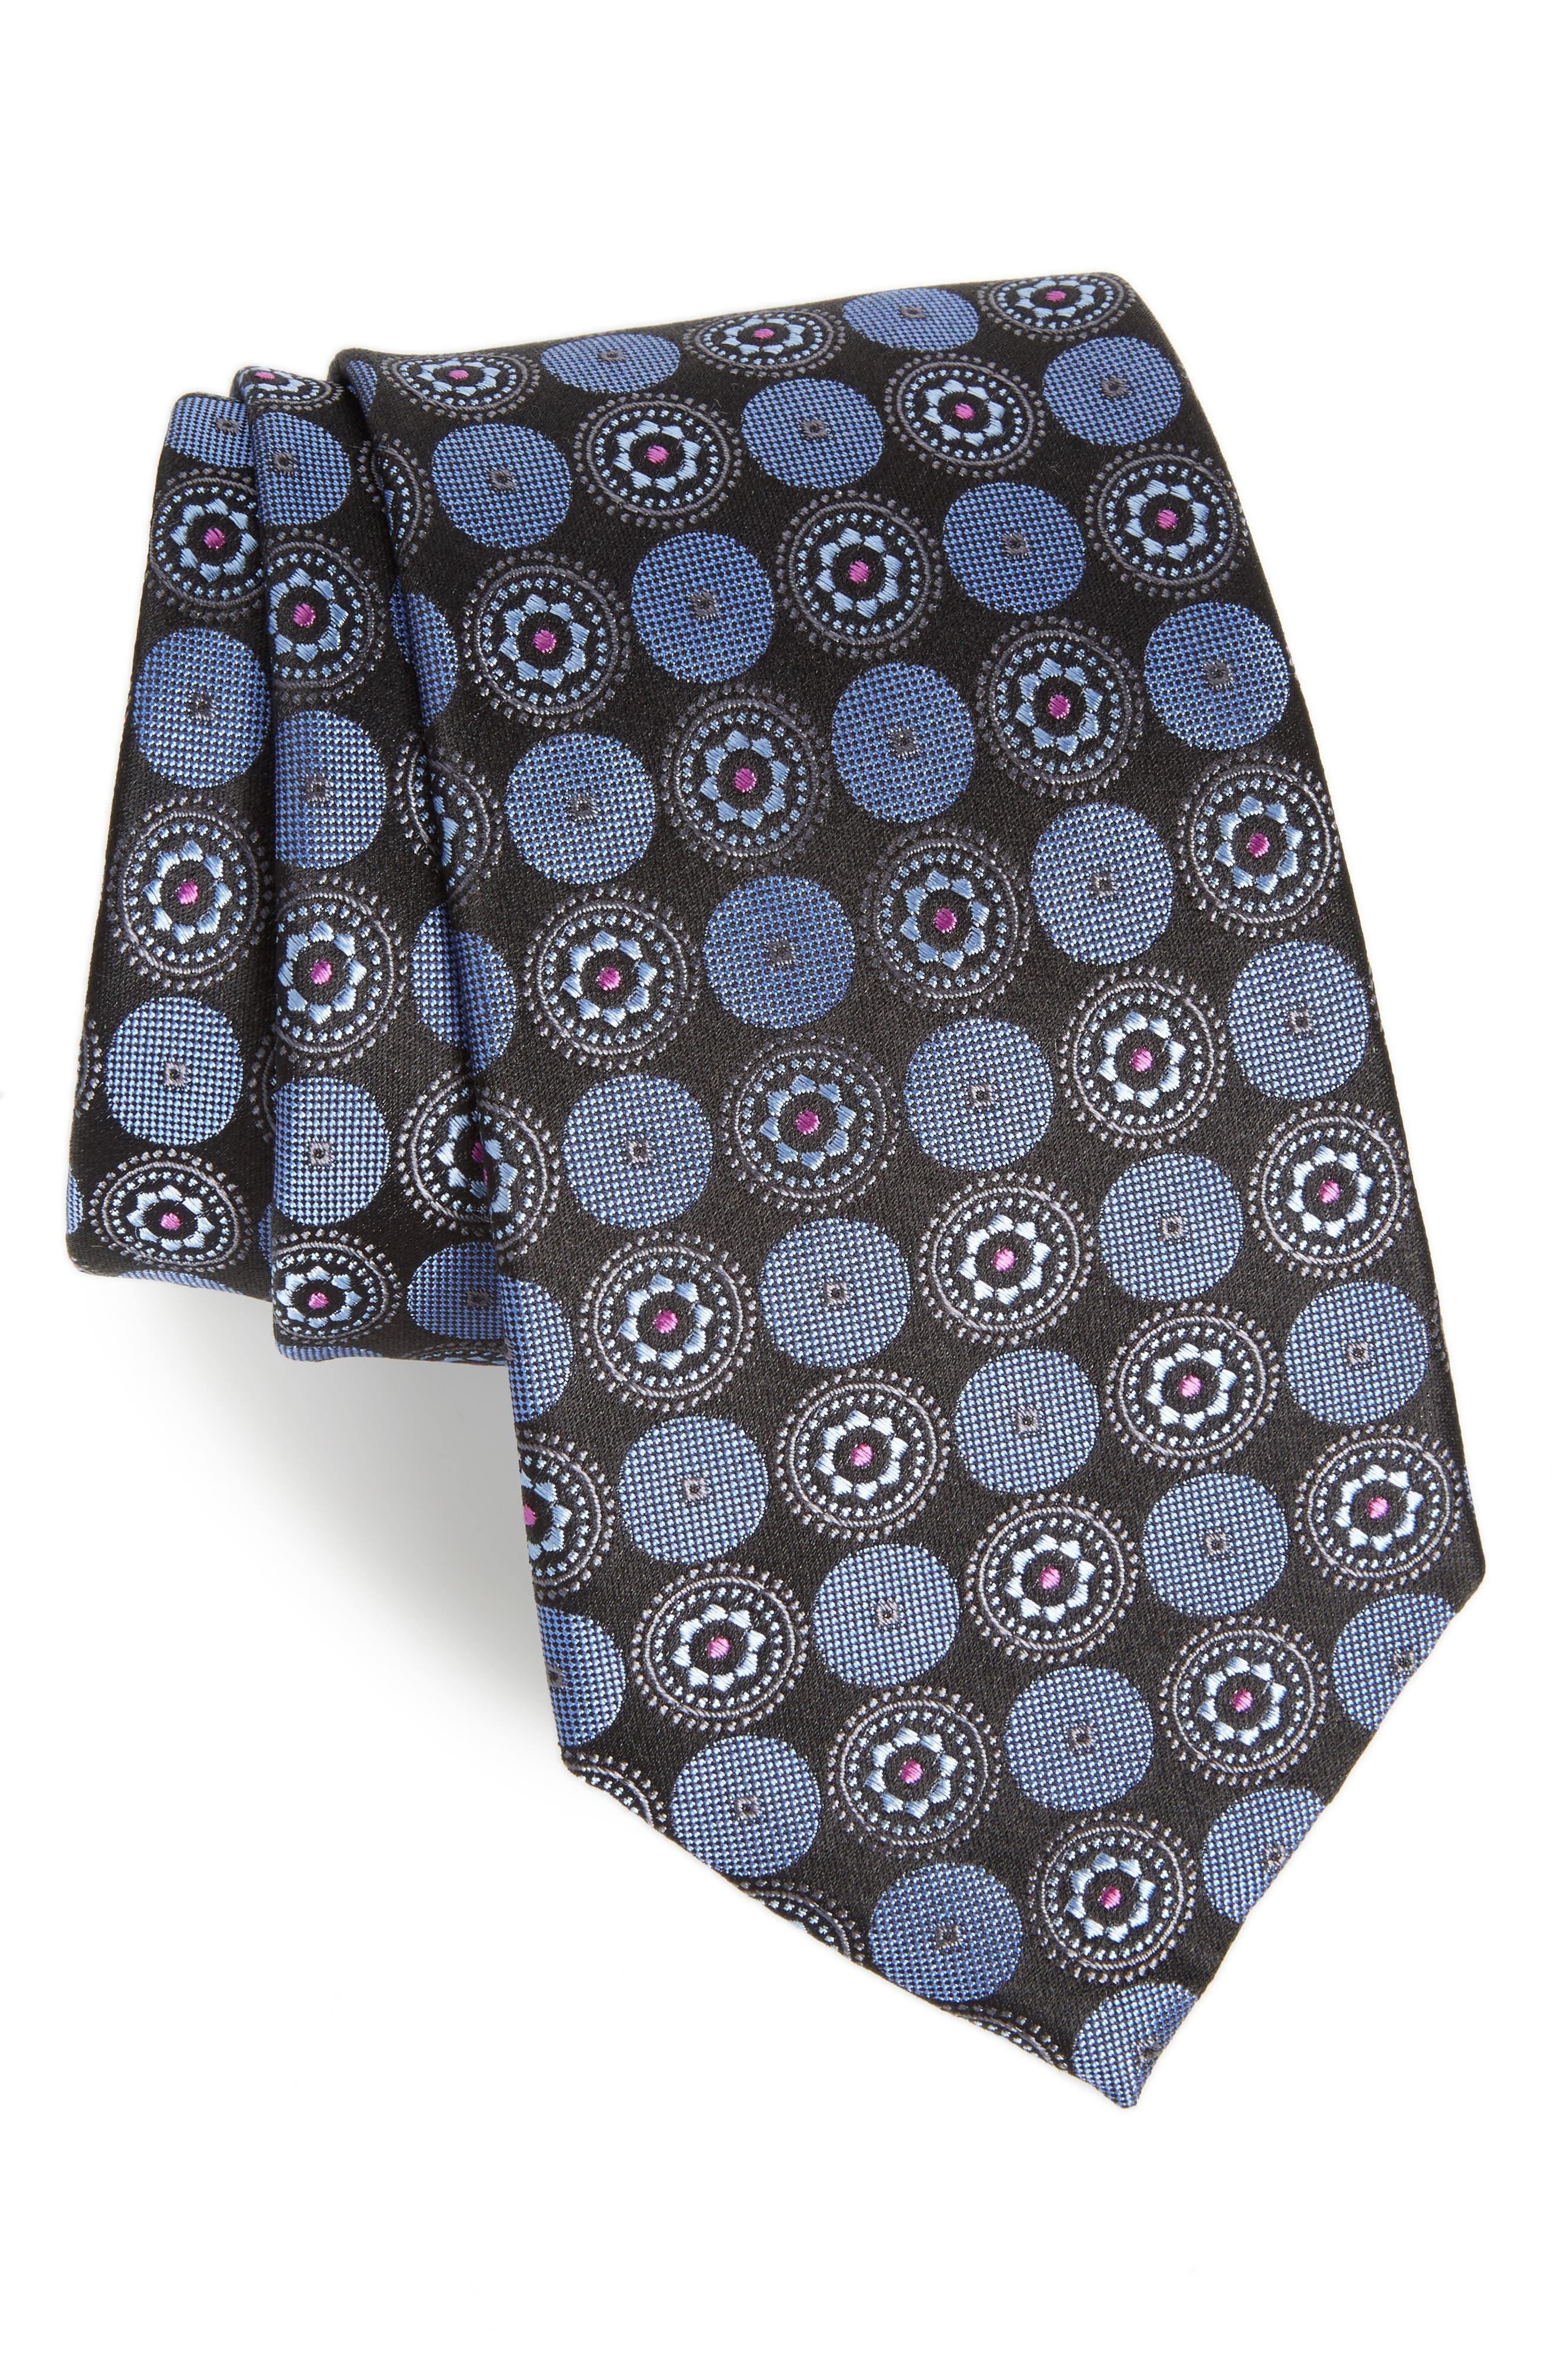 Alternate Image 1 Selected - Nordstrom Men's Shop Old English Medallion Silk Tie